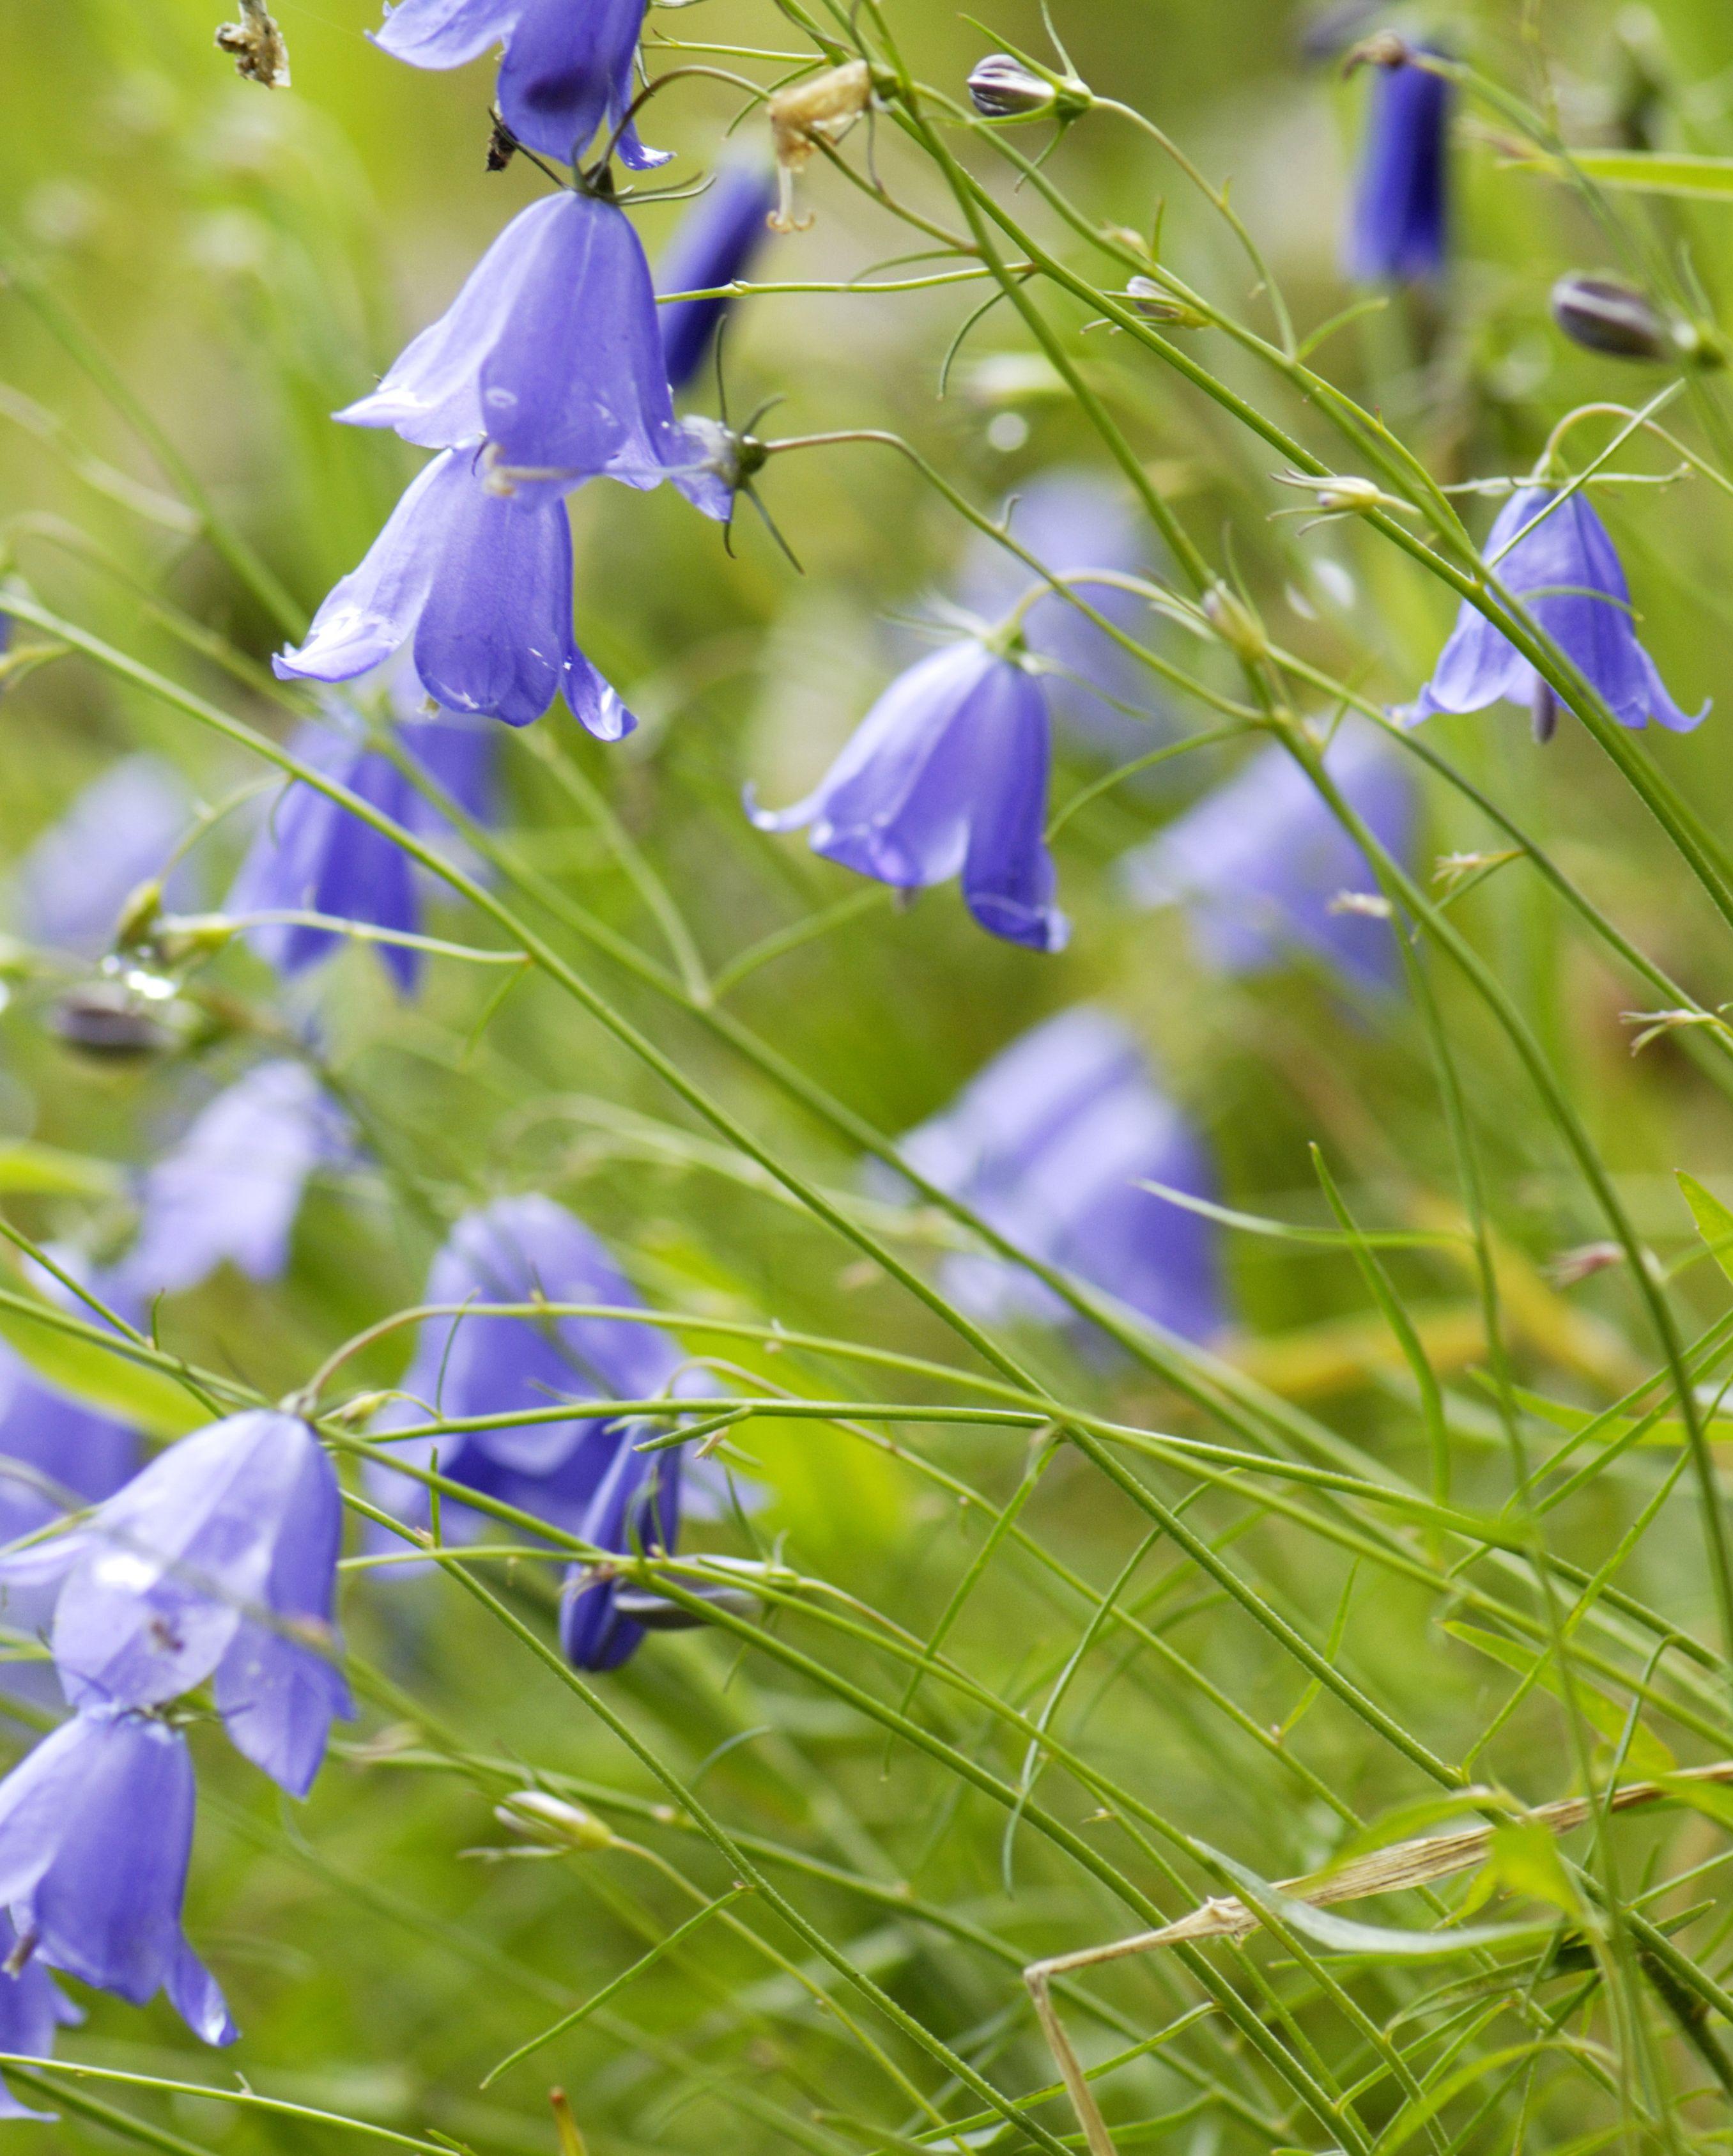 Bellflower, Campanula rotundifolia, close-up